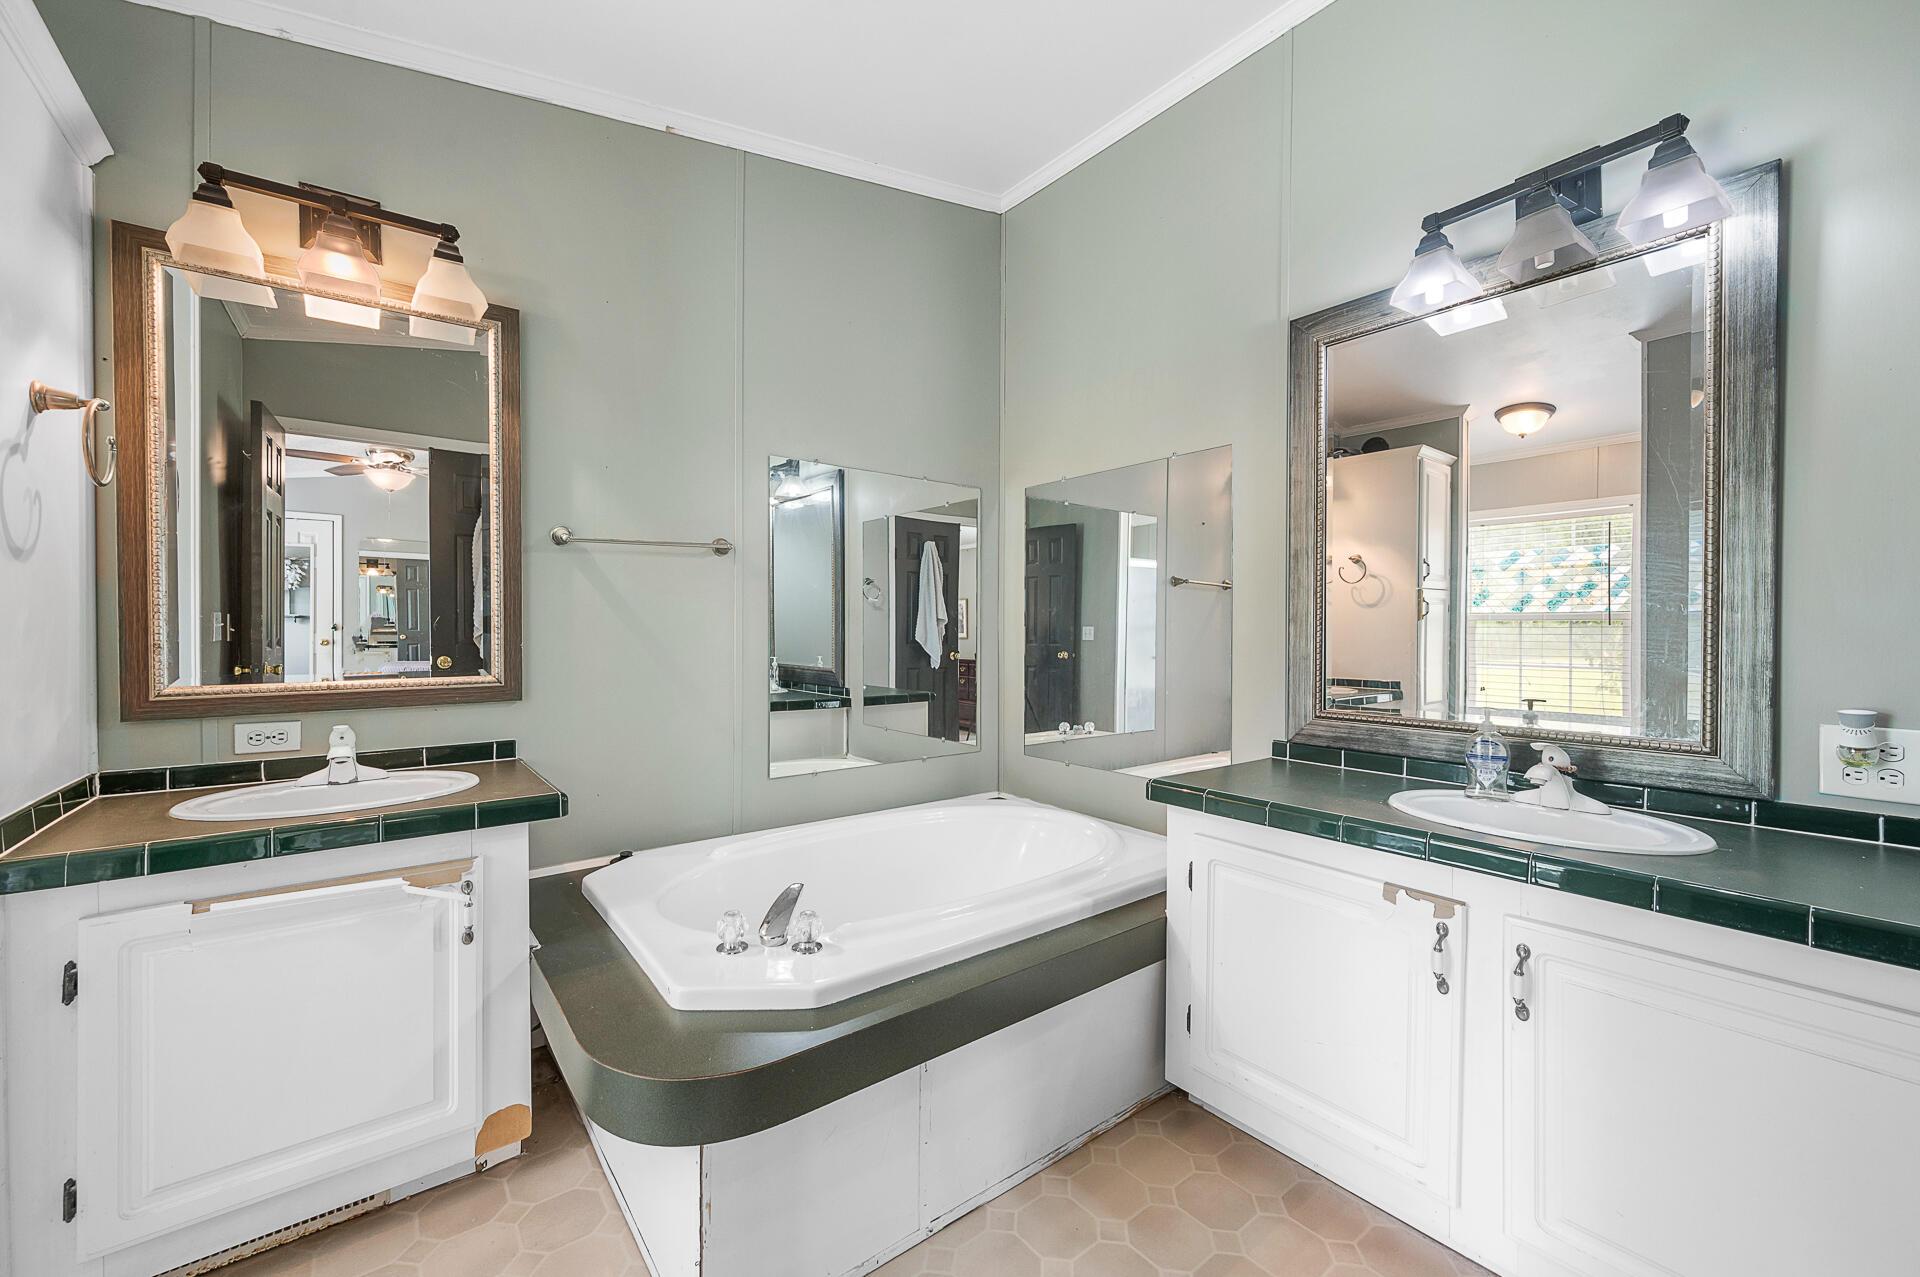 Clemson Terrace Homes For Sale - 250 Medina, Summerville, SC - 20